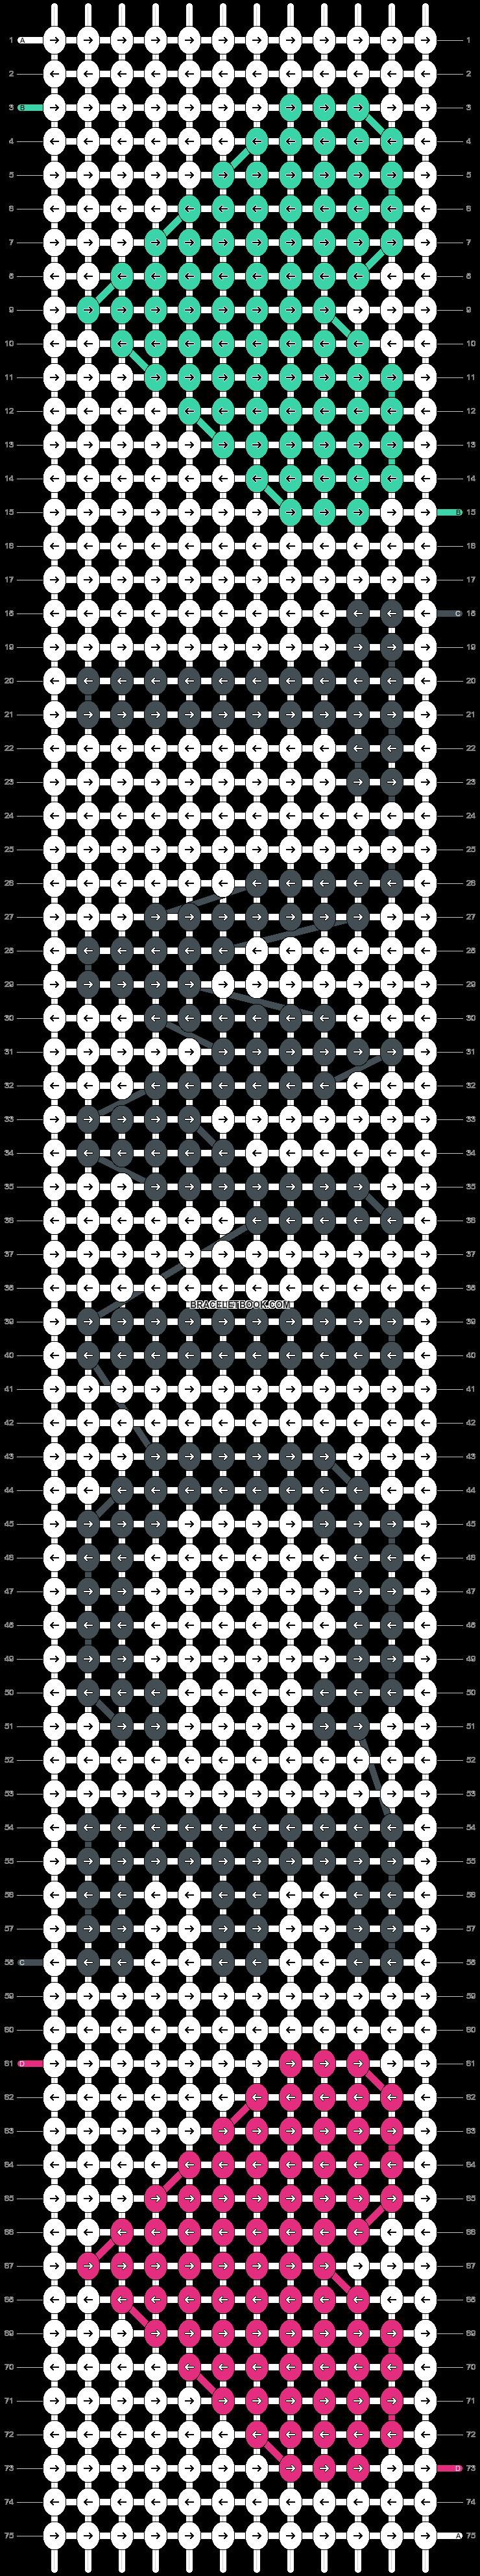 Alpha pattern #21302 pattern